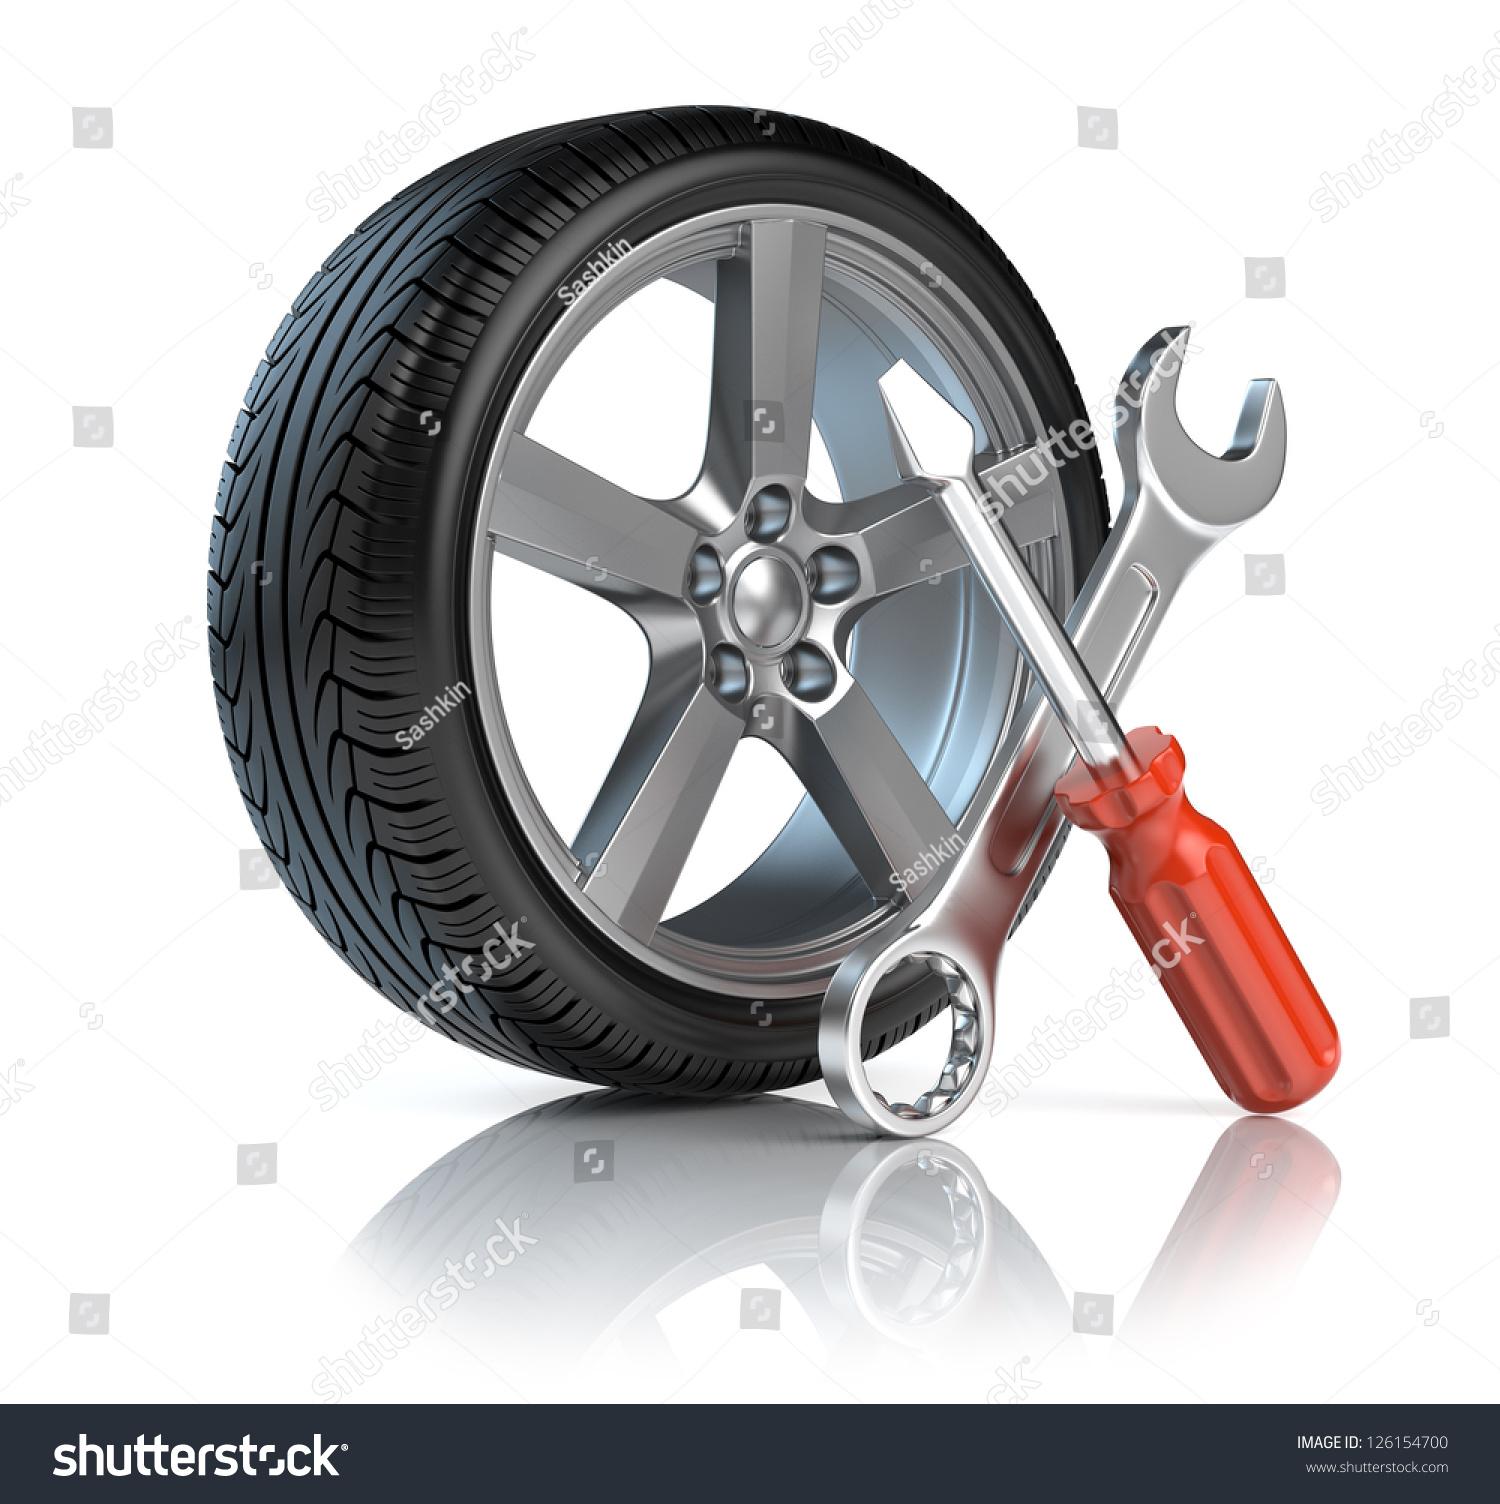 wheel repair stock illustration 126154700 shutterstock. Black Bedroom Furniture Sets. Home Design Ideas